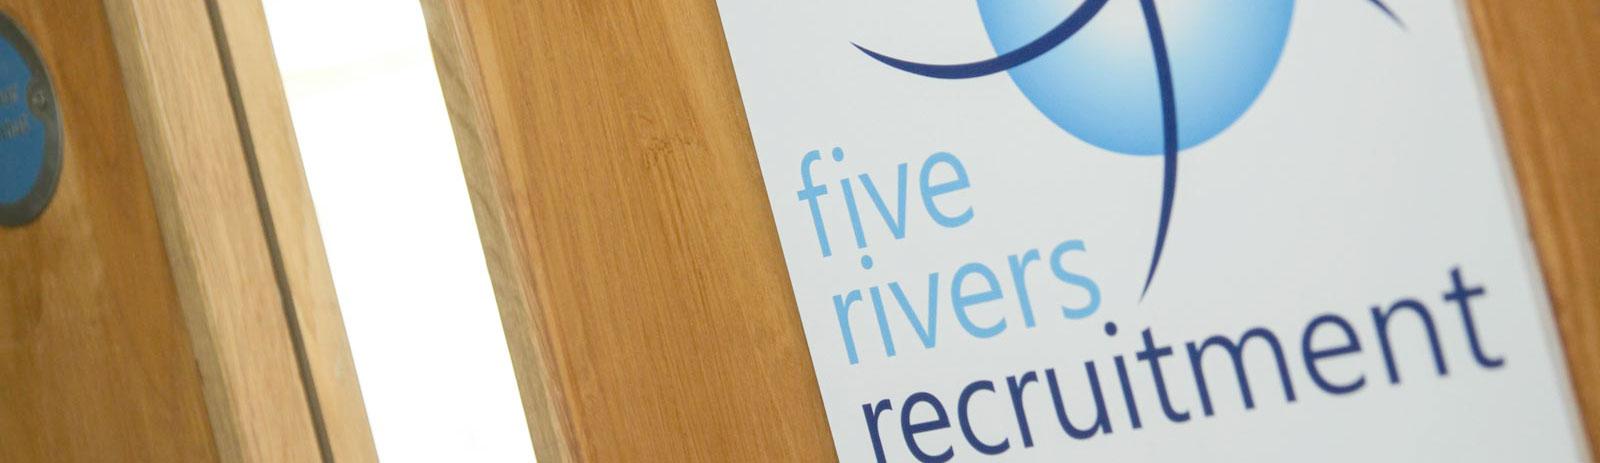 Registration - Five Rivers